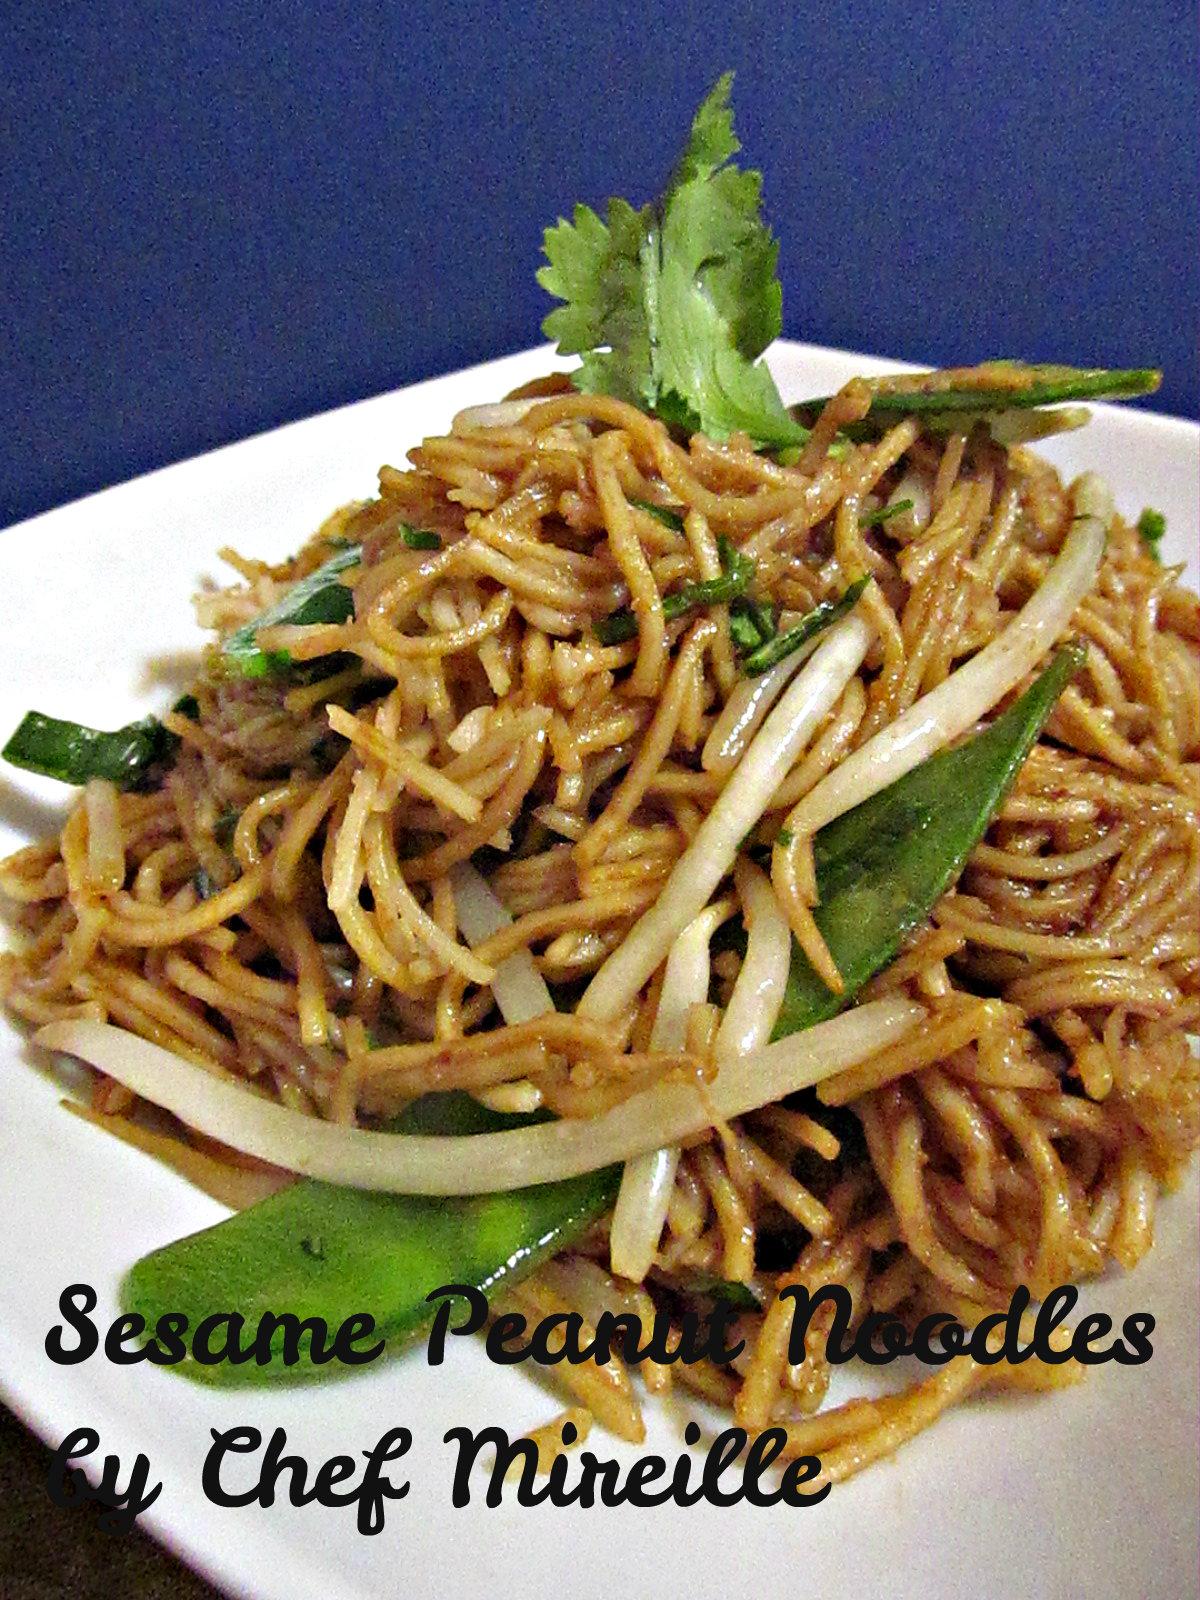 Sesame Peanut Noodles - The Schizo Chef